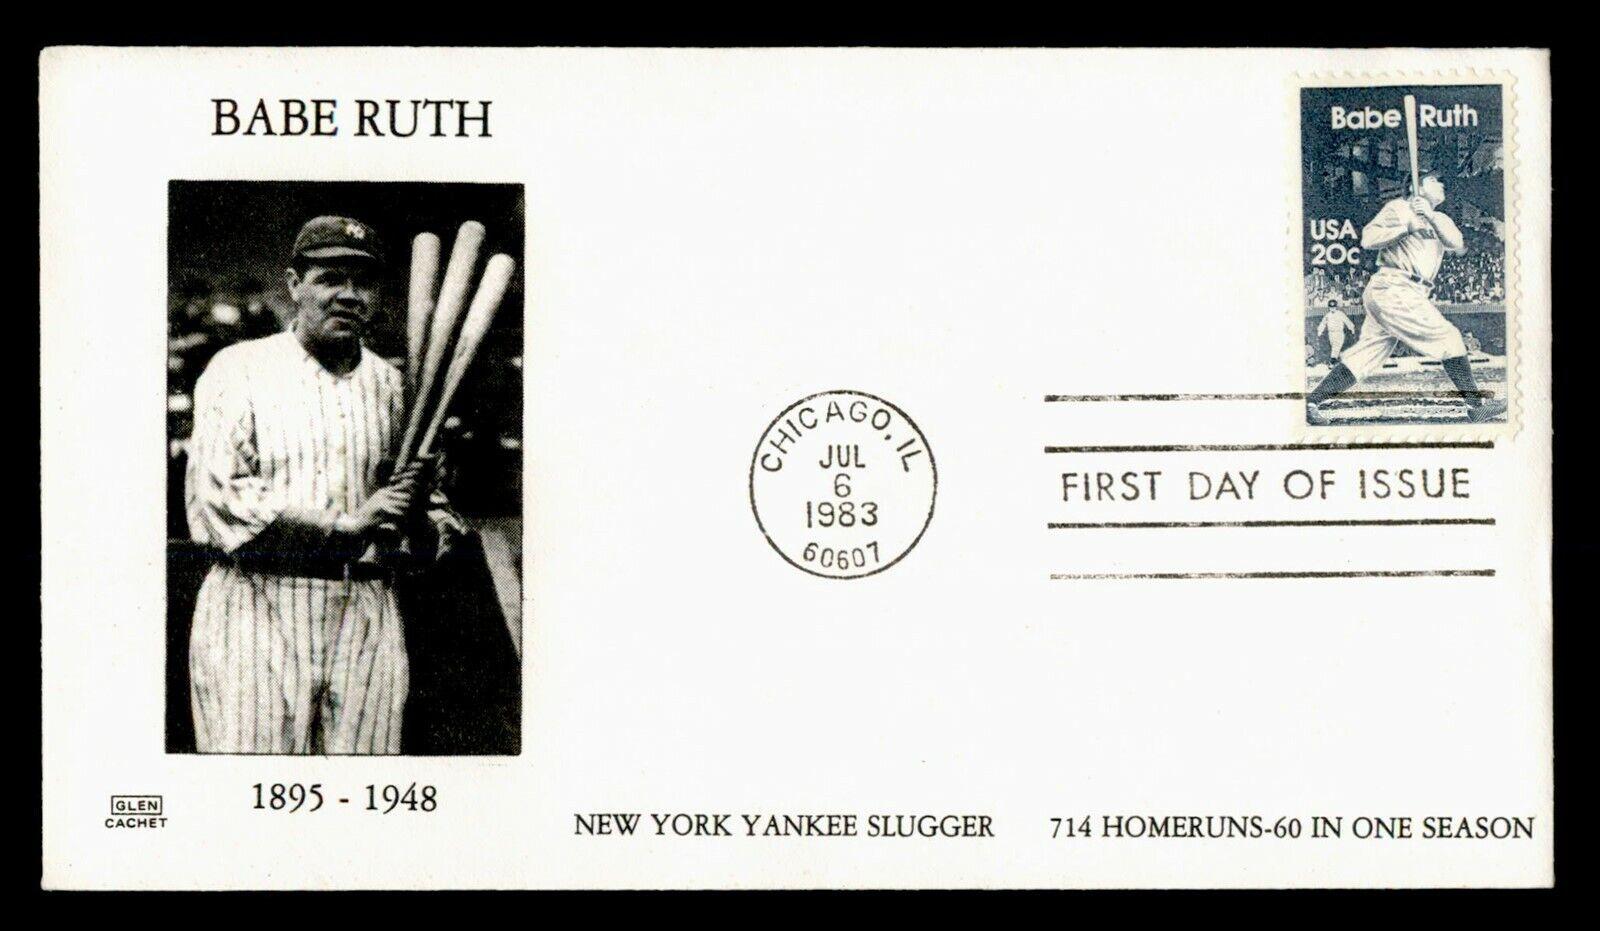 DR WHO 1983 FDC BABE RUTH BASEBALL PLAYER GLEN CACHET C218650 - $0.50